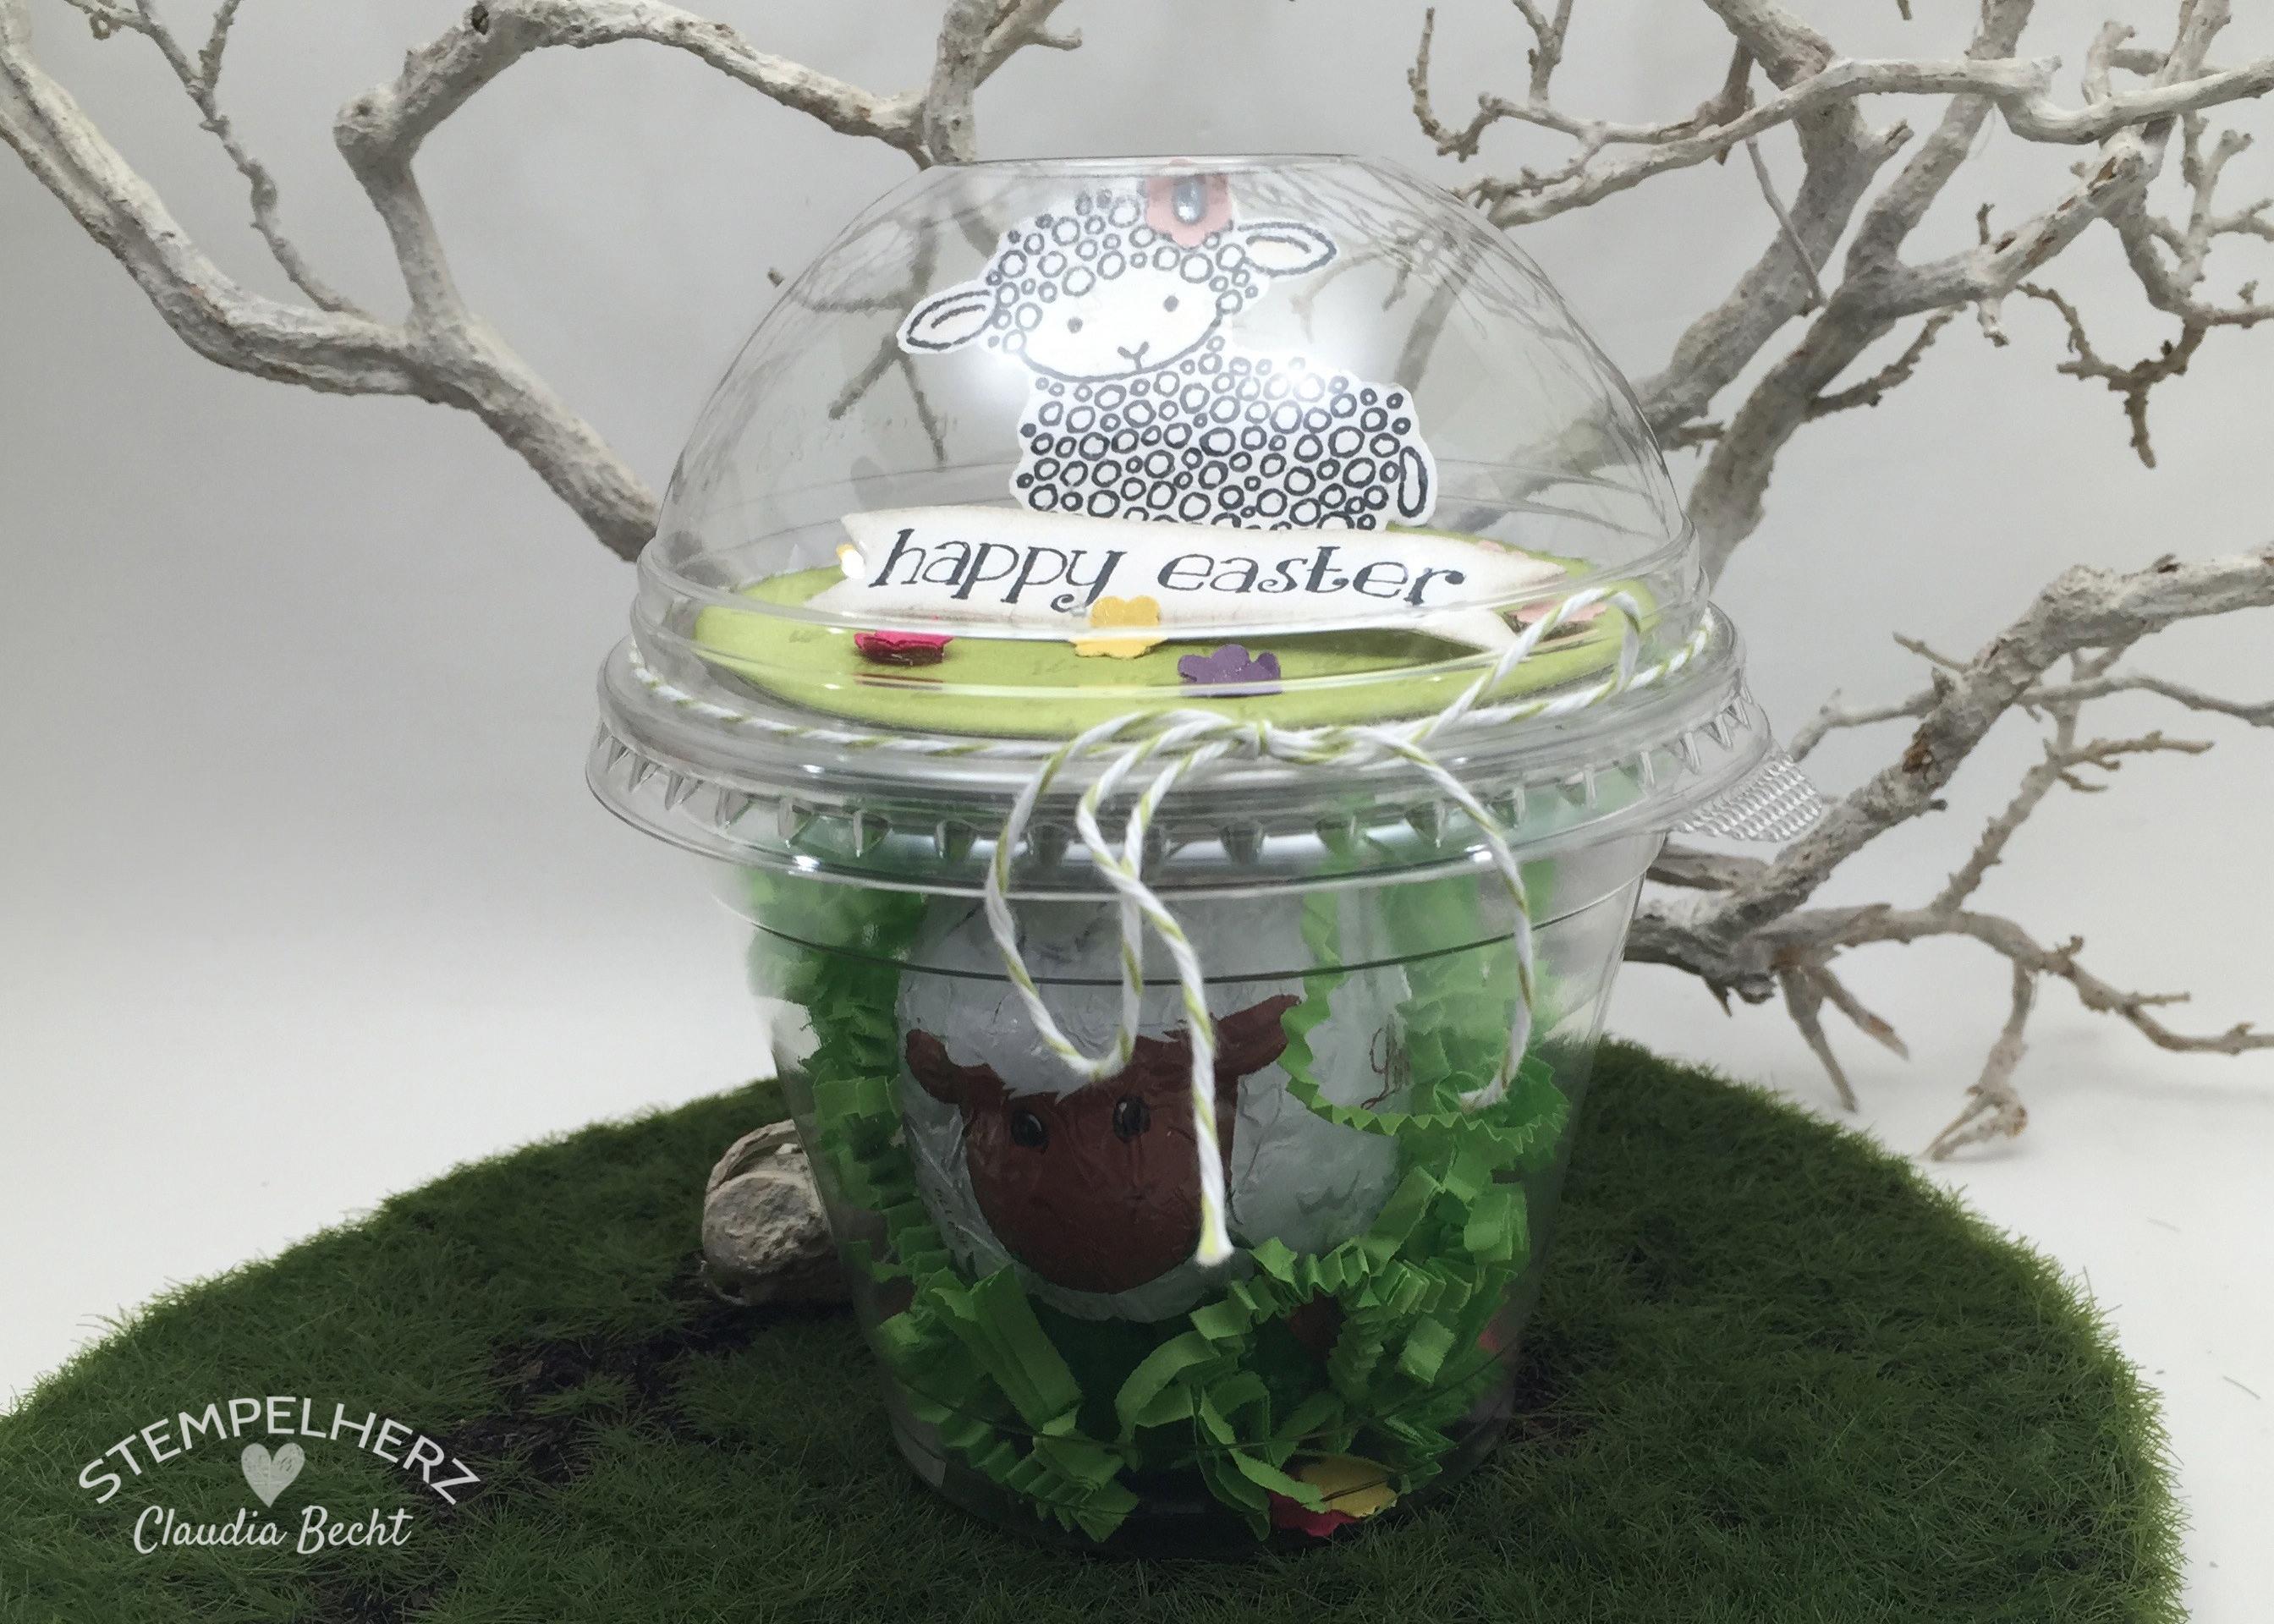 Stempelherz - Stampin Up - Verpackung - Dombecher - Ostern - Easter Lamb - Ein Osterlamm im Dombecher 02